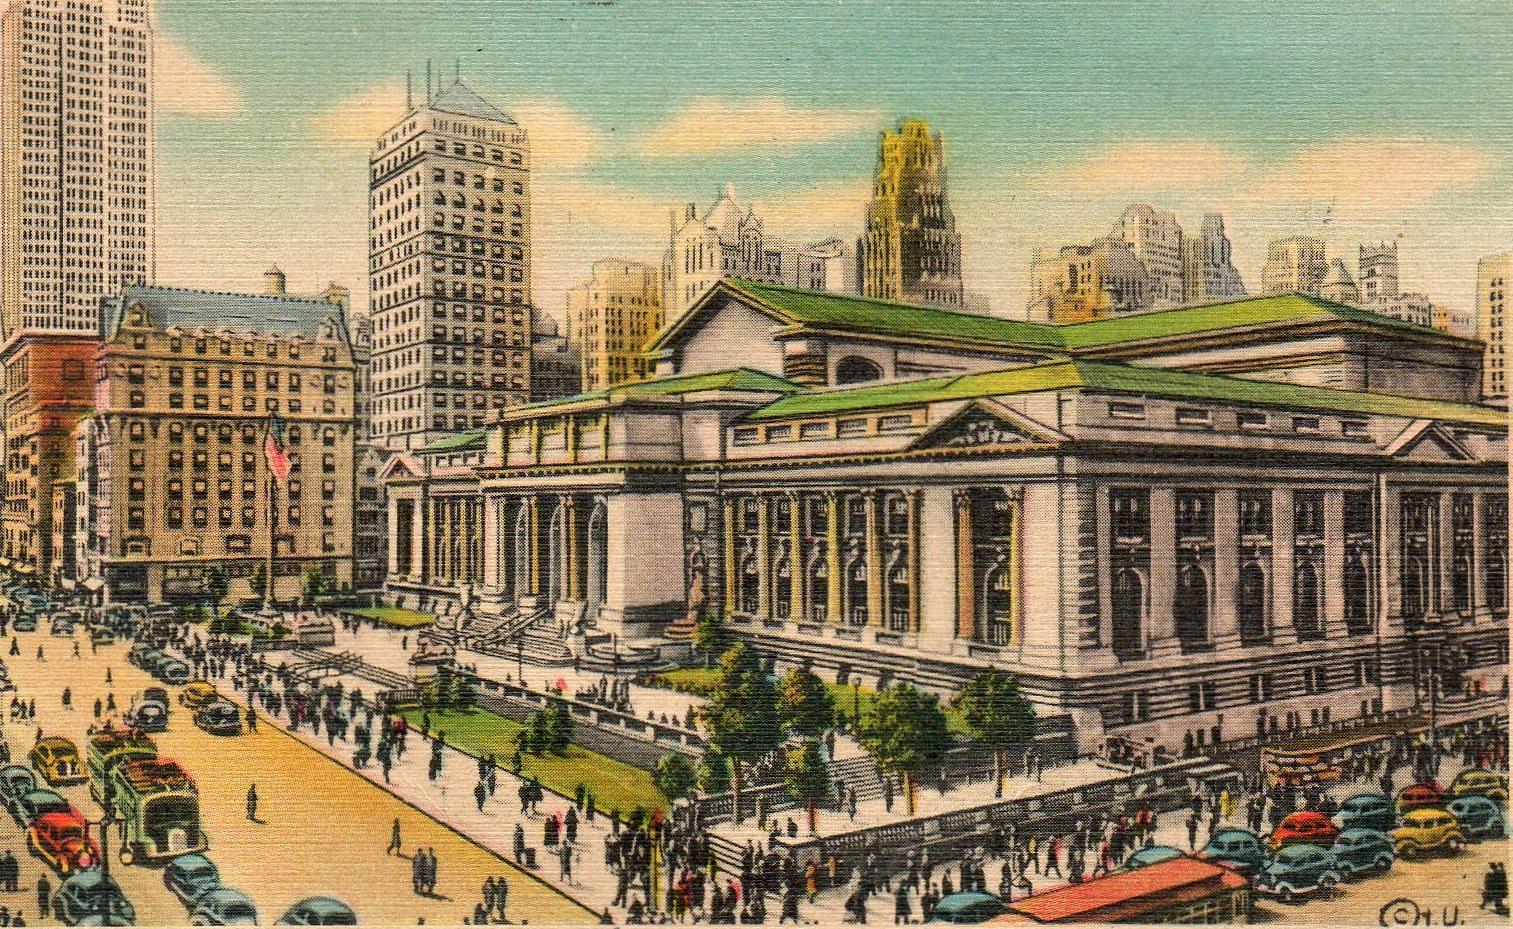 New York Public Library Ephemeral New York